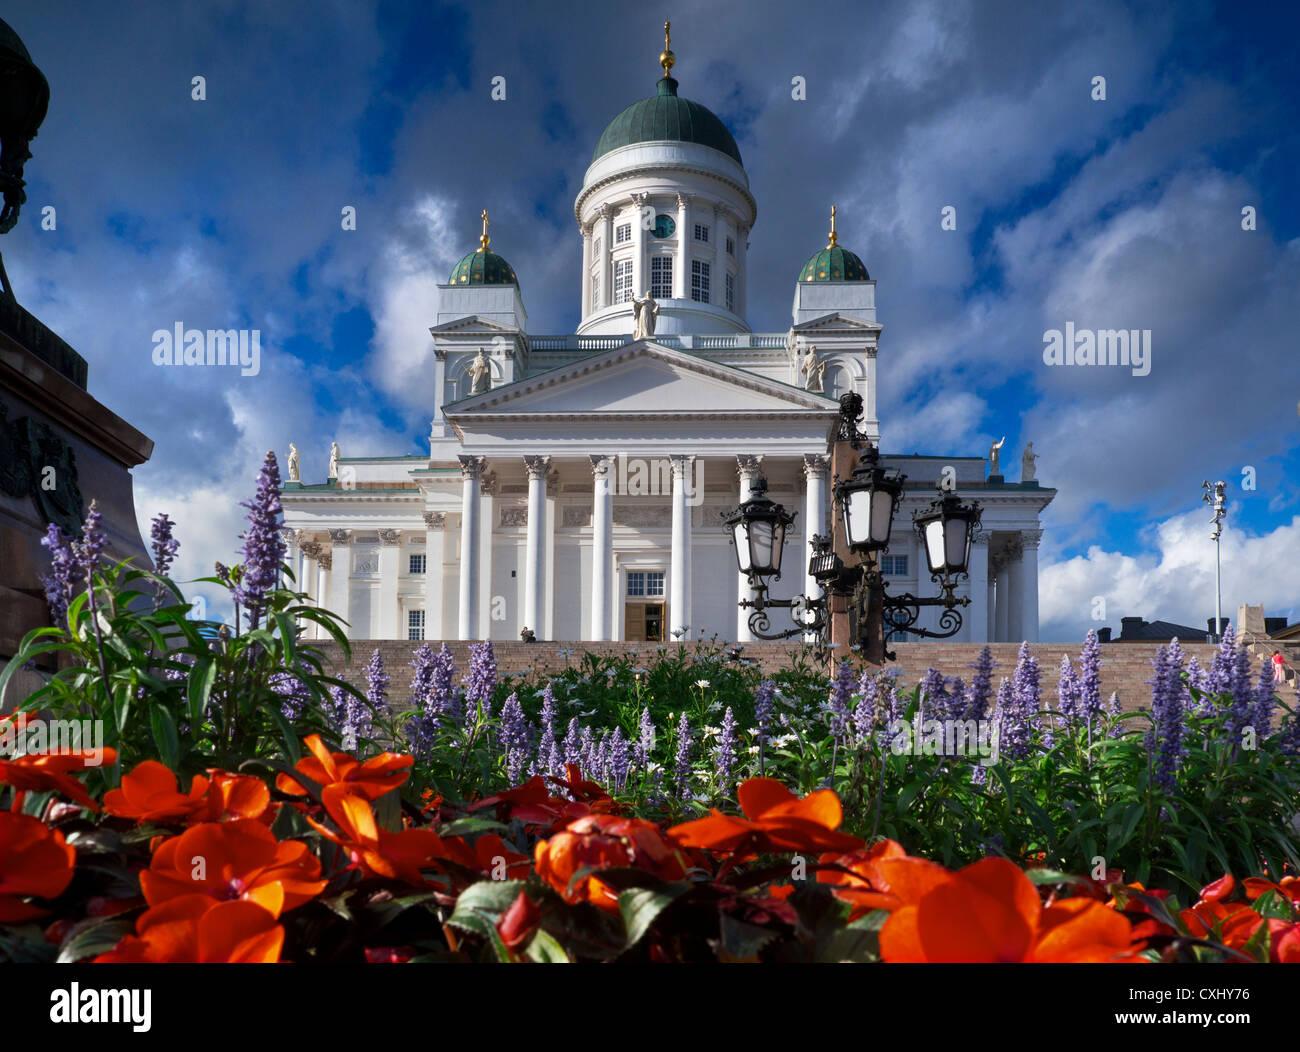 The landmark Helsinki Cathedral with dramatic sky Senate Square Helsinki Finland - Stock Image